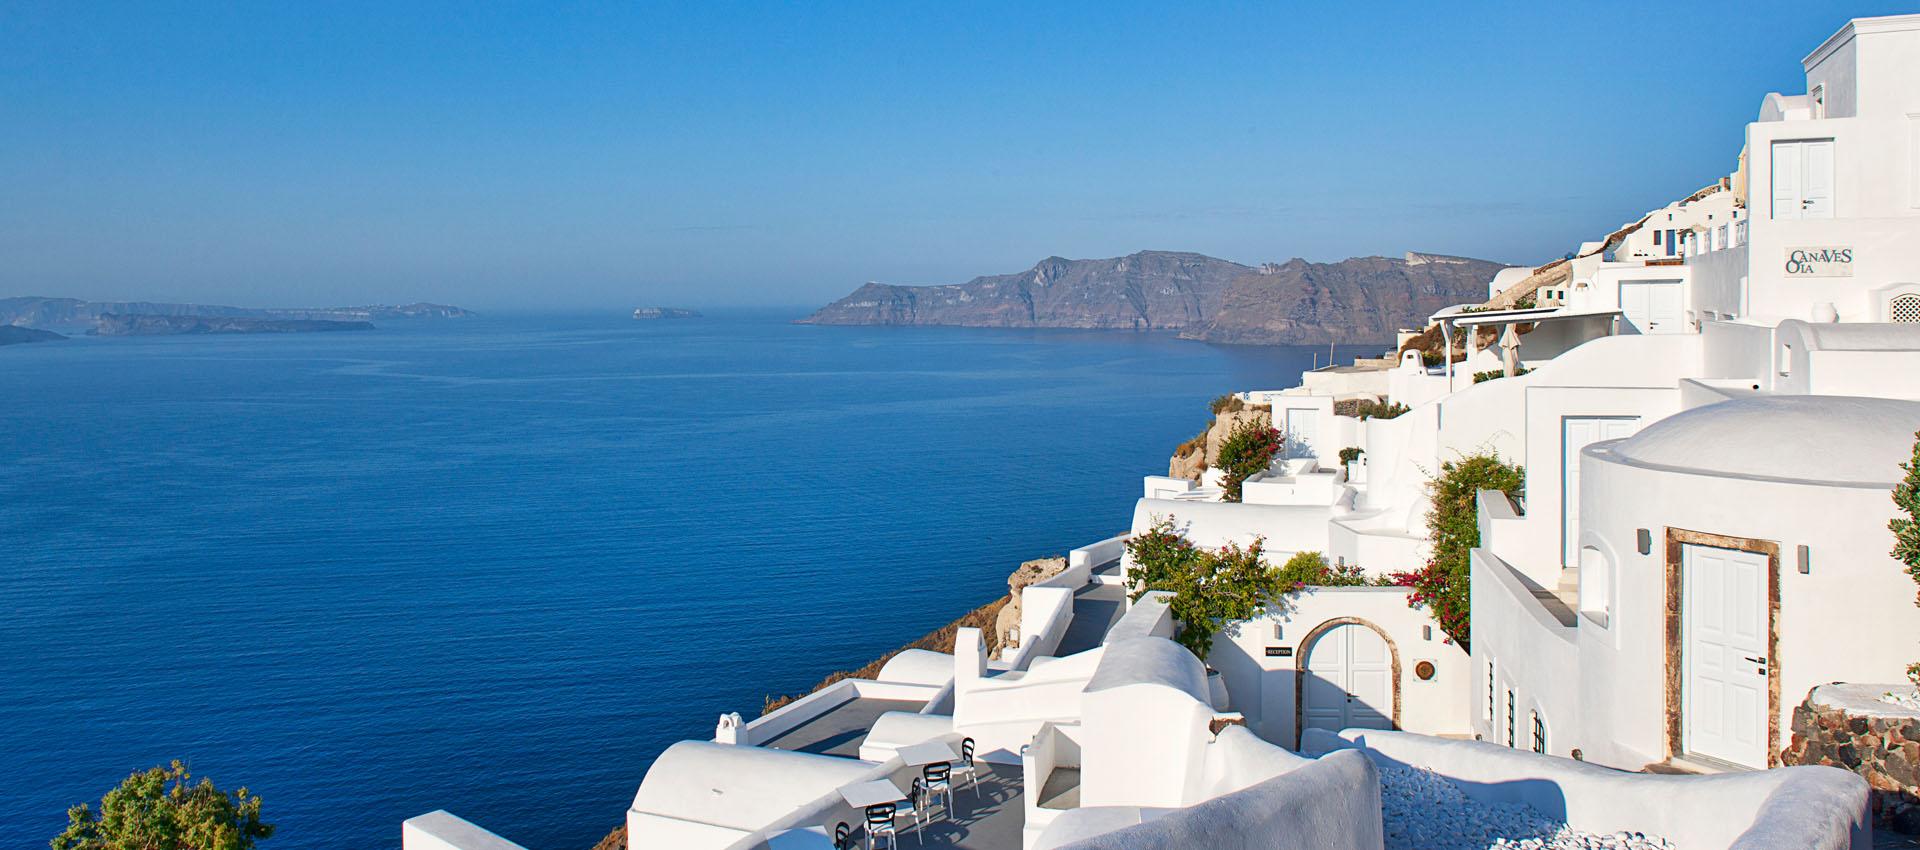 Santorini best hotel oia